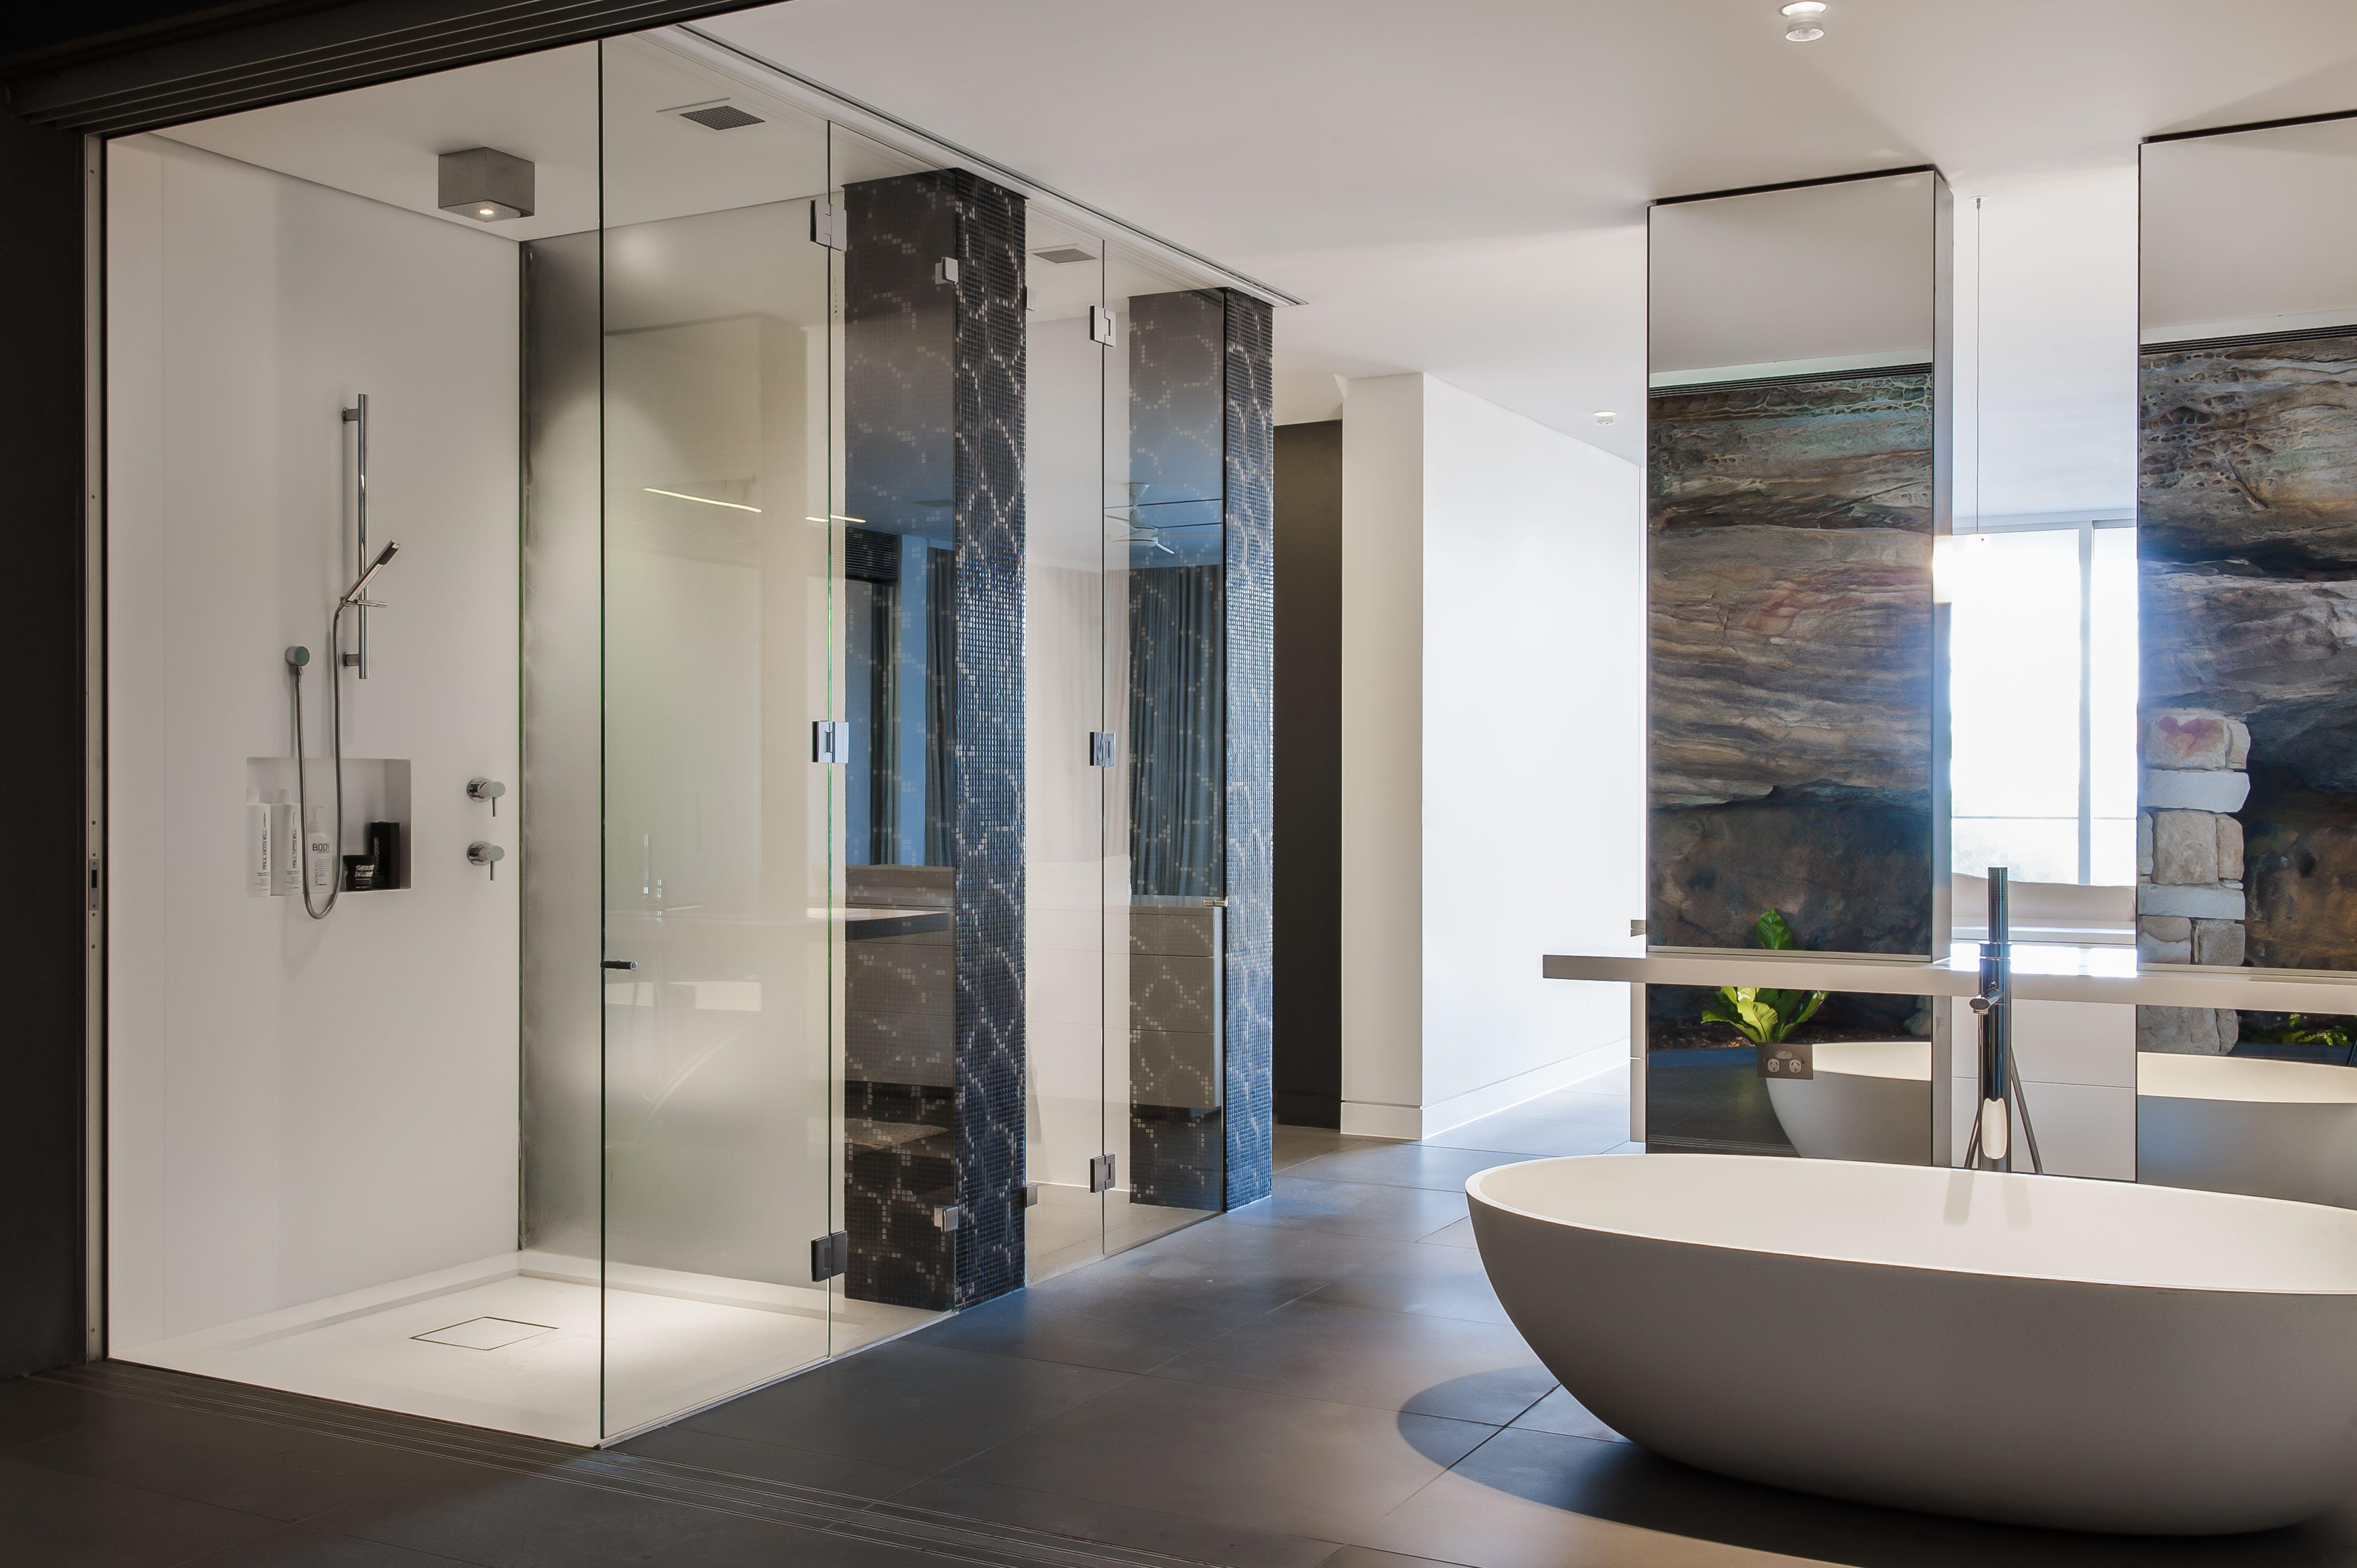 BATHROOMS AUSTRALIA - Google Search | BATHROOM Luxury and High End ...